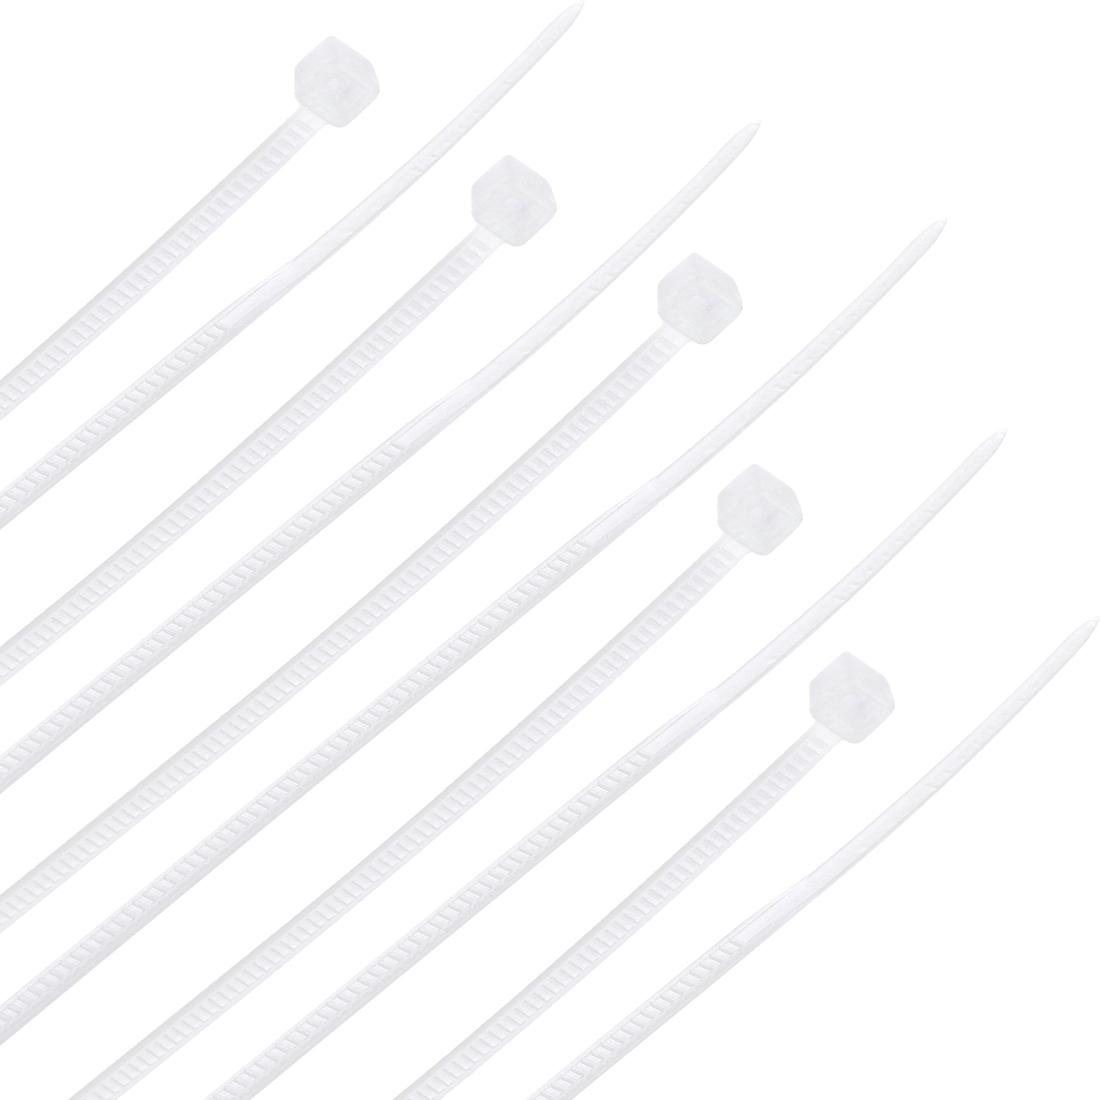 Cable Zip Ties 100mmx1.8mm Self-Locking Nylon Tie Wraps White 300pcs